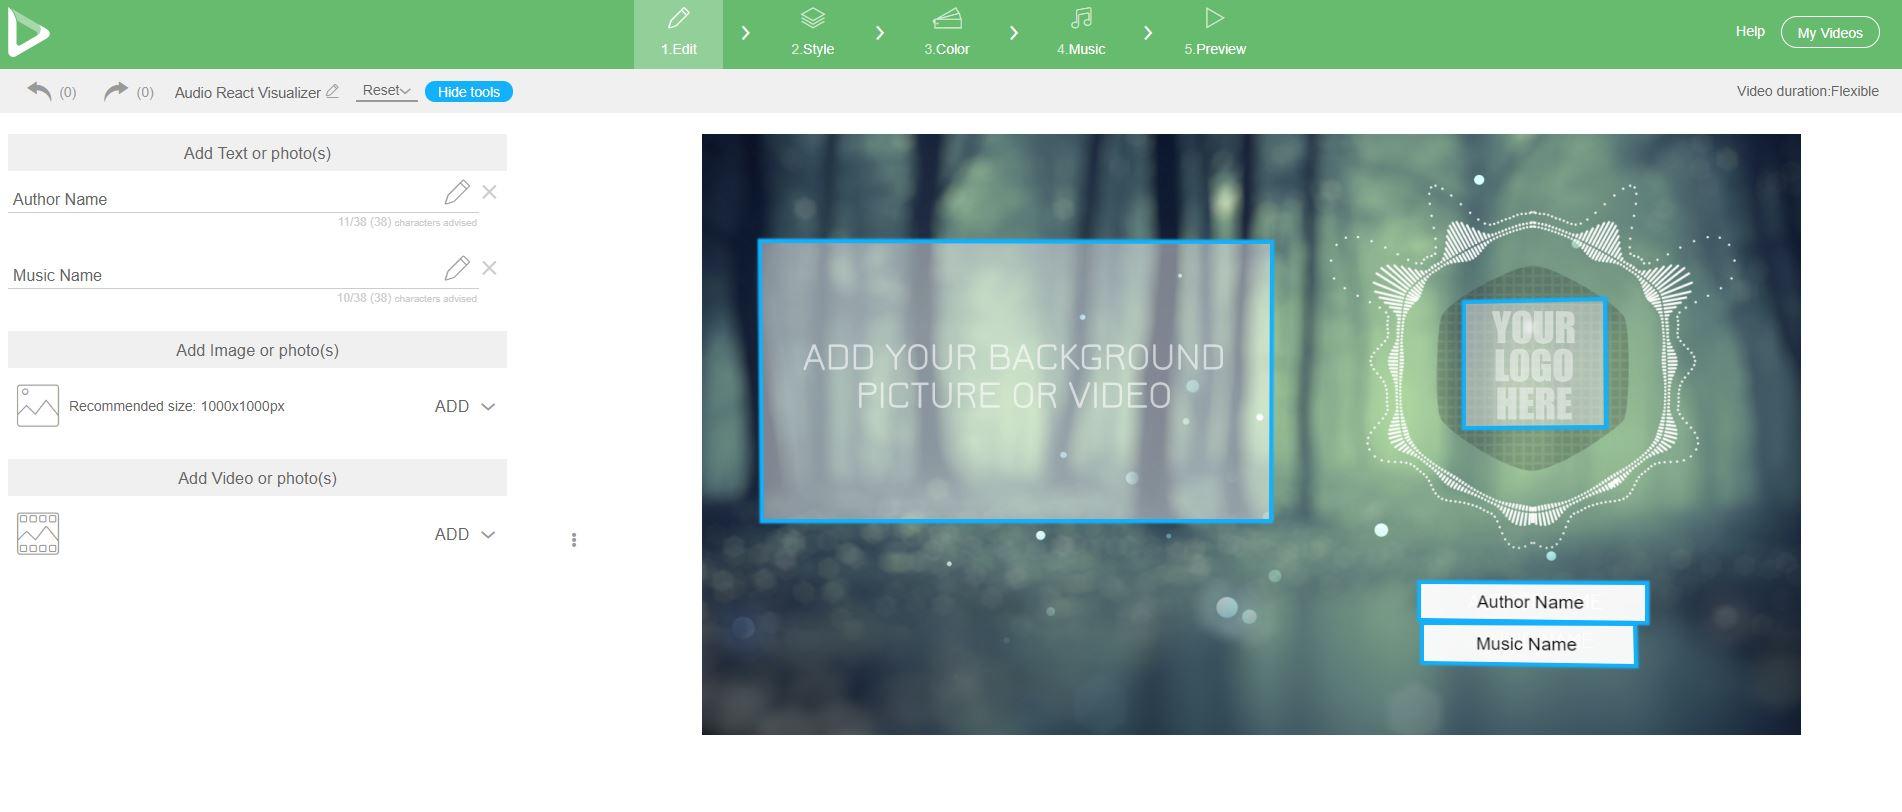 Audio React Visualizer Editor